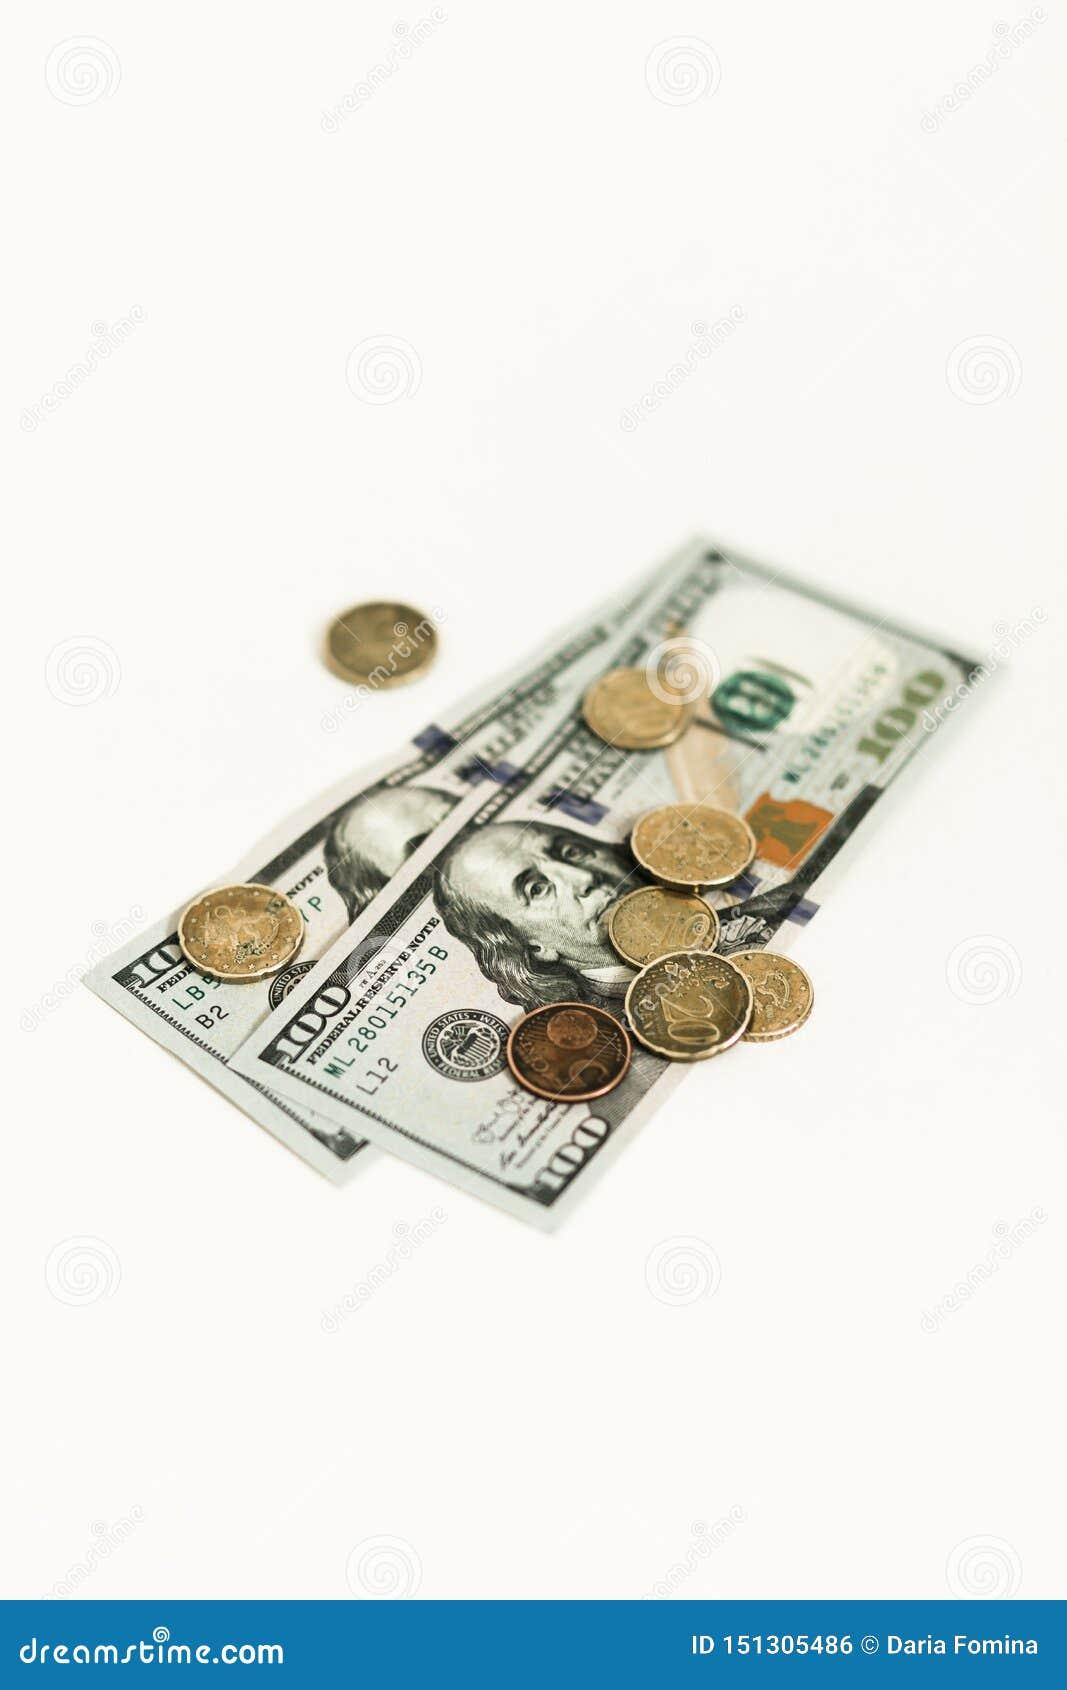 Dollari e centesimi isolati su fondo bianco